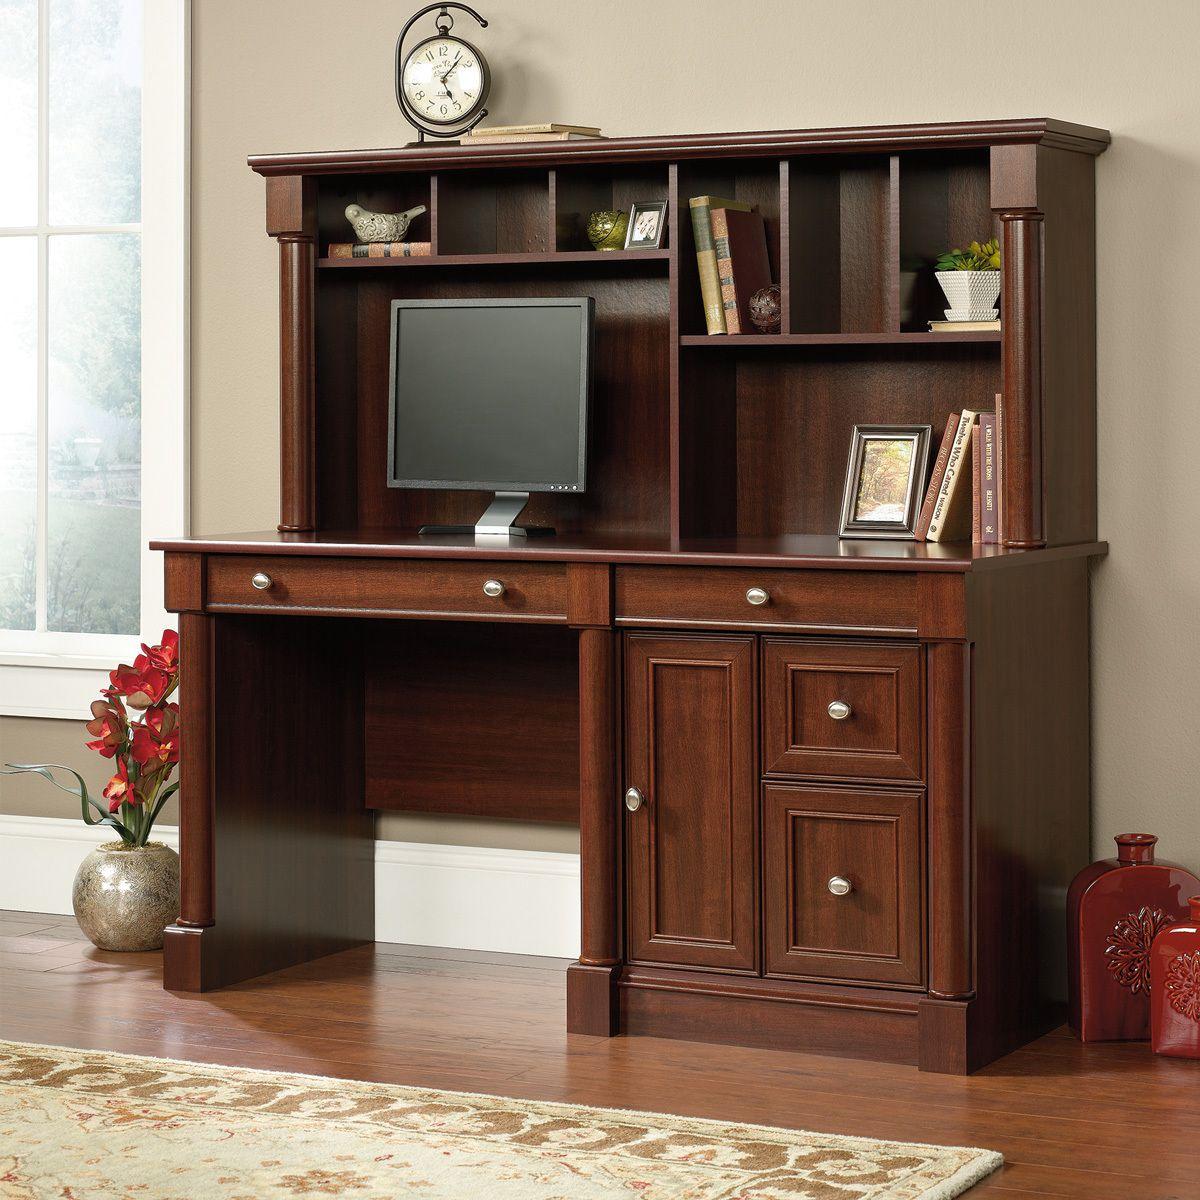 j conrad furniture sauder palladia computer desk with hutch rh pinterest com